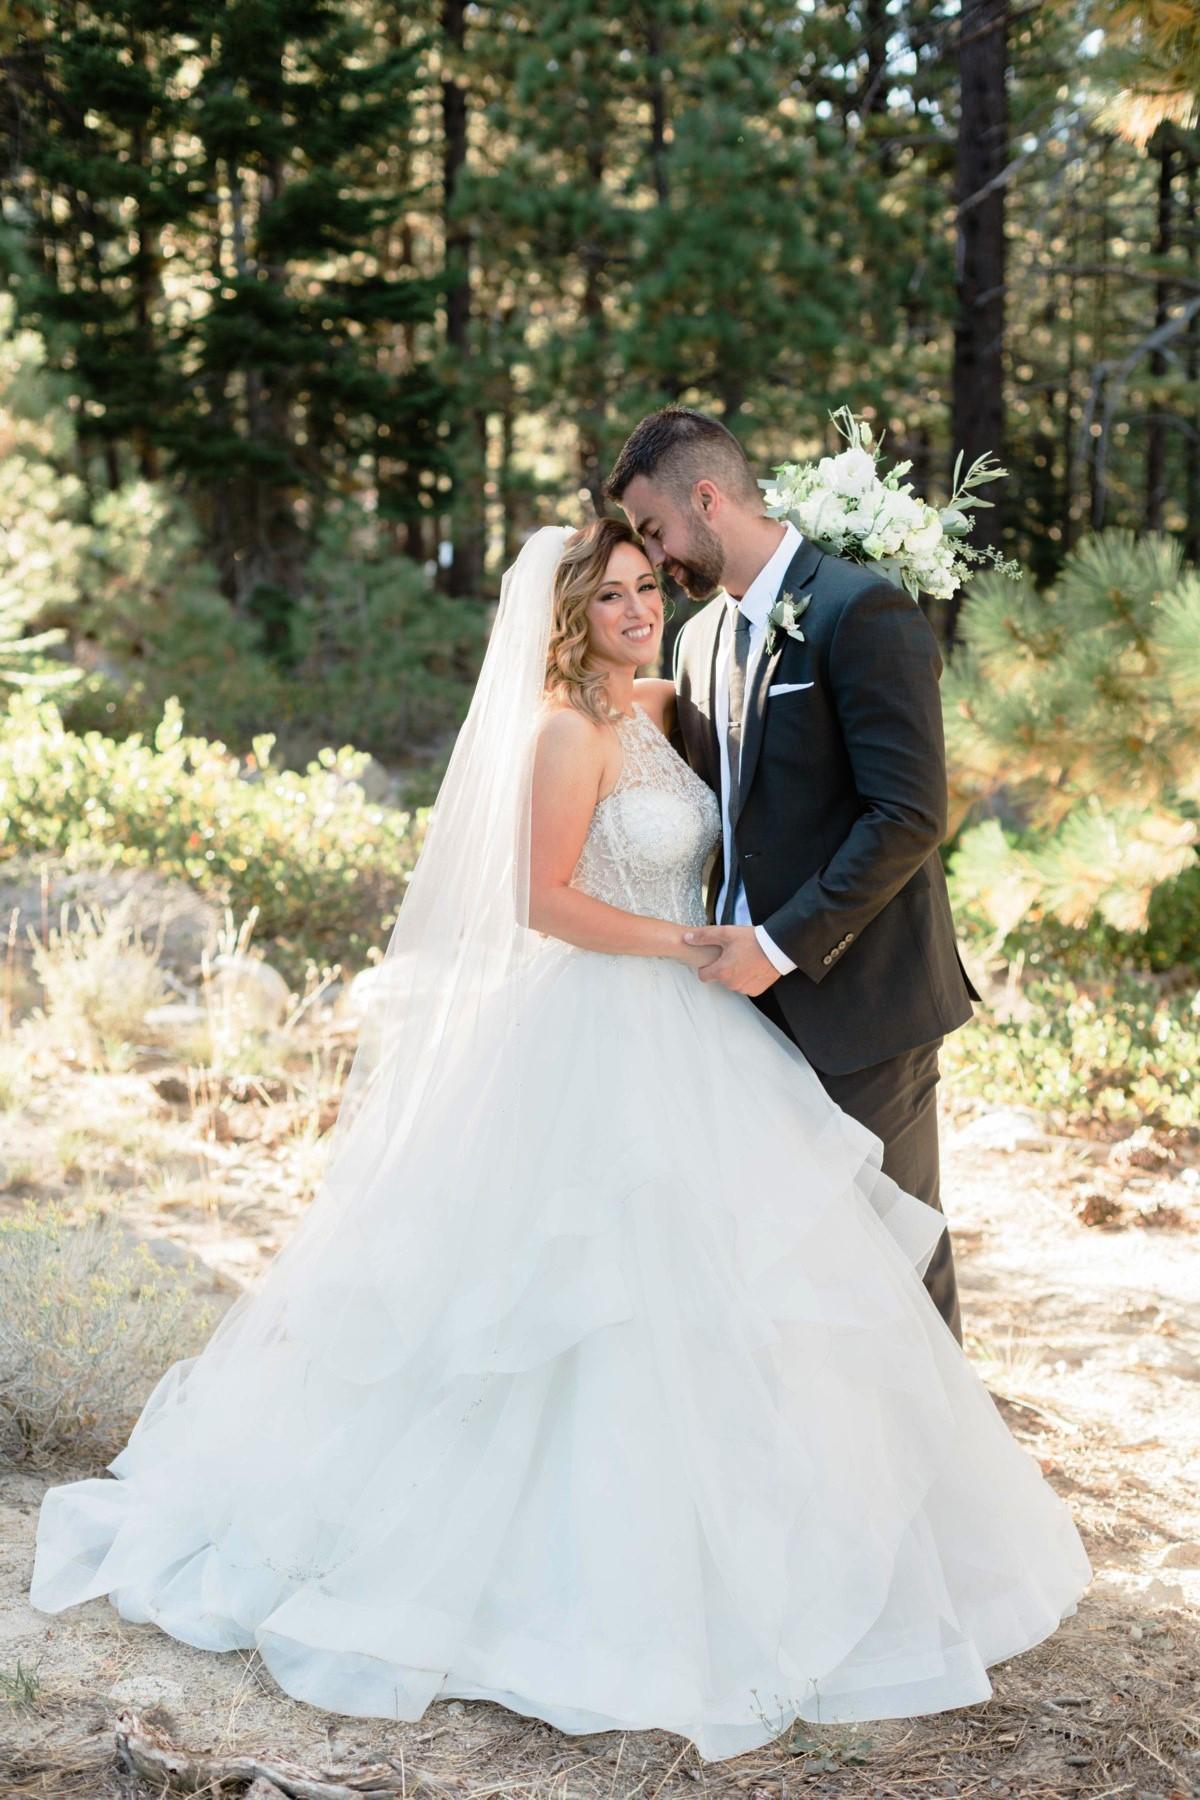 Nancy Rice Artistry - Lake Tahoe wedding hair & makeup - couple outdoors